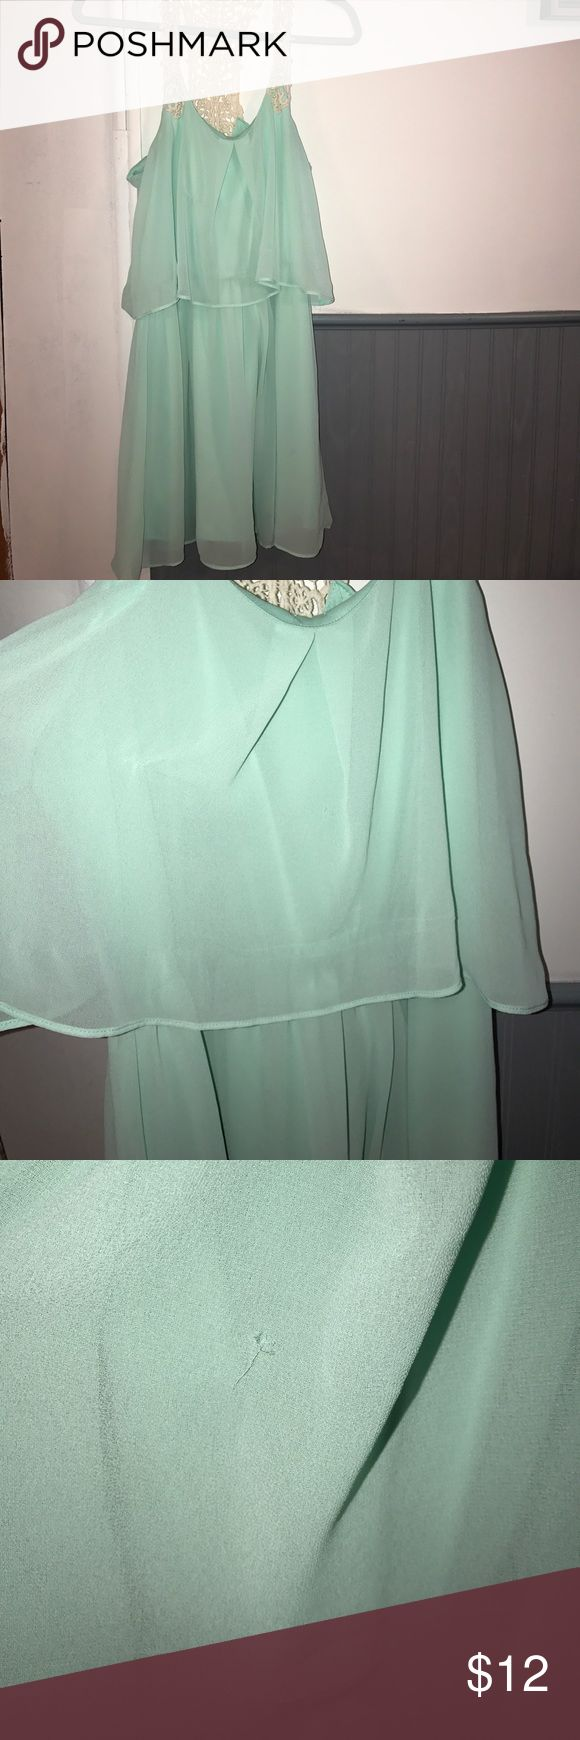 Light blue dress Light blue chevron dress Dresses